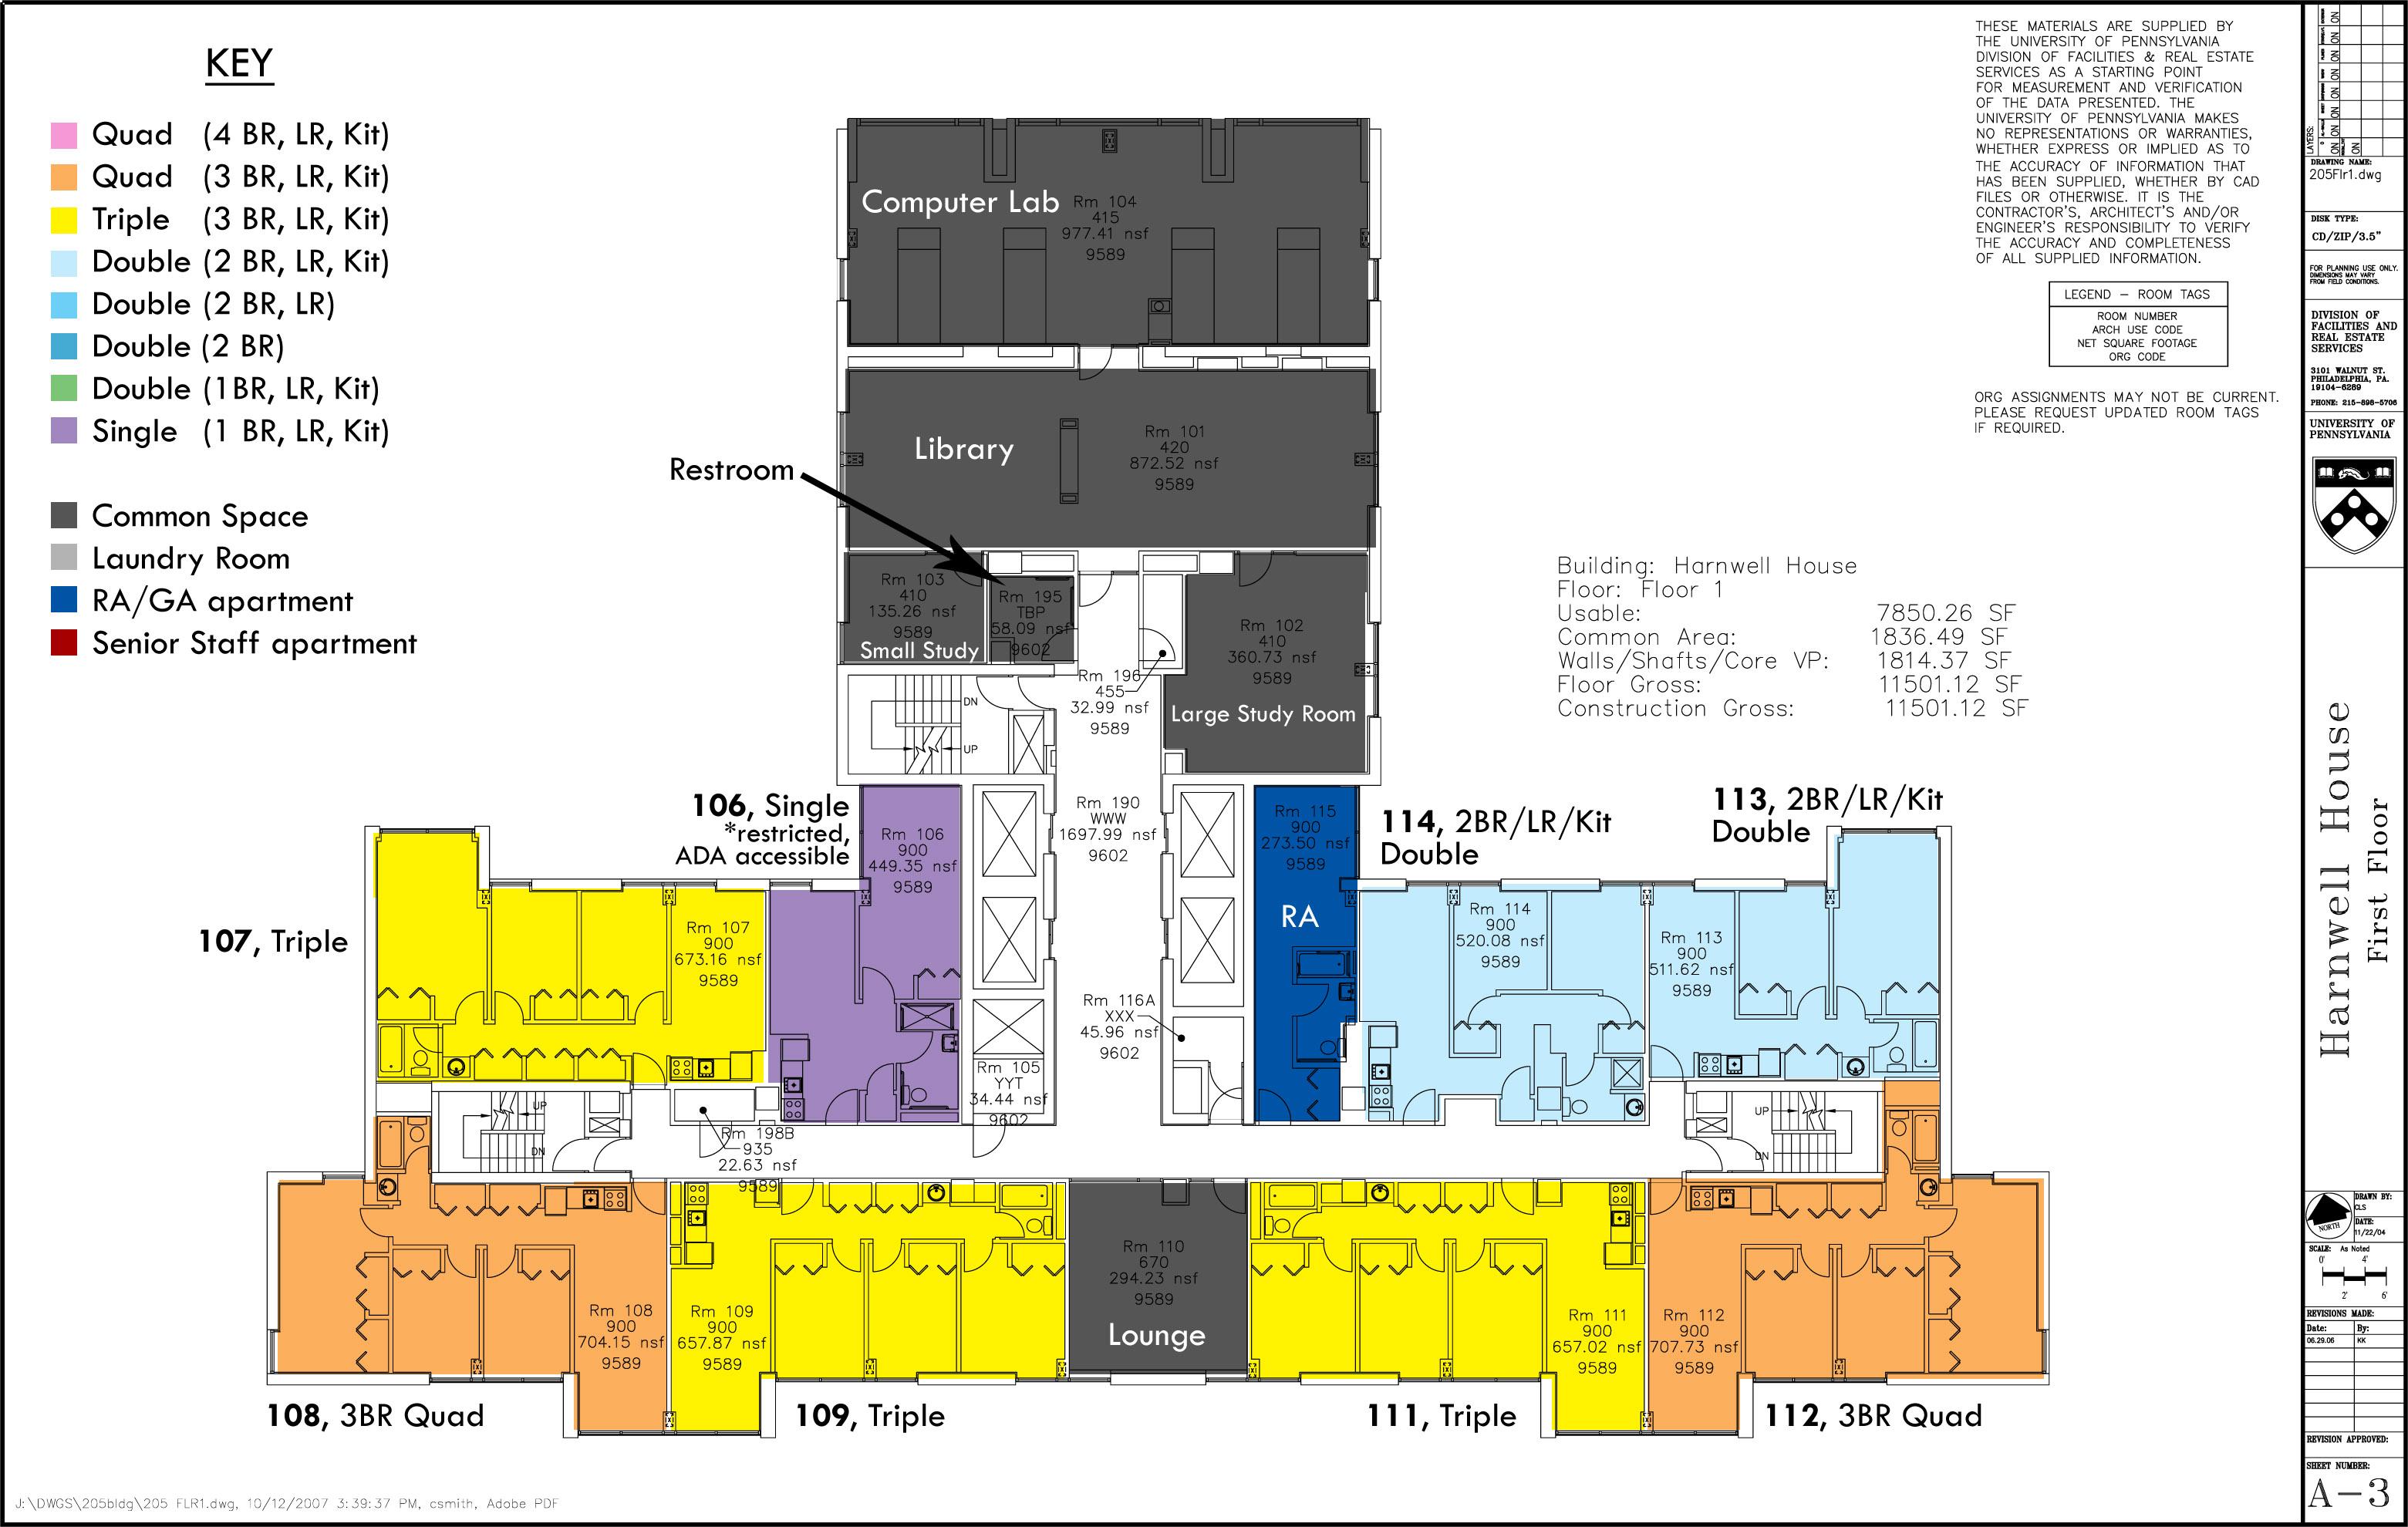 floor plans college houses academic services harnwell 1st floor jpg